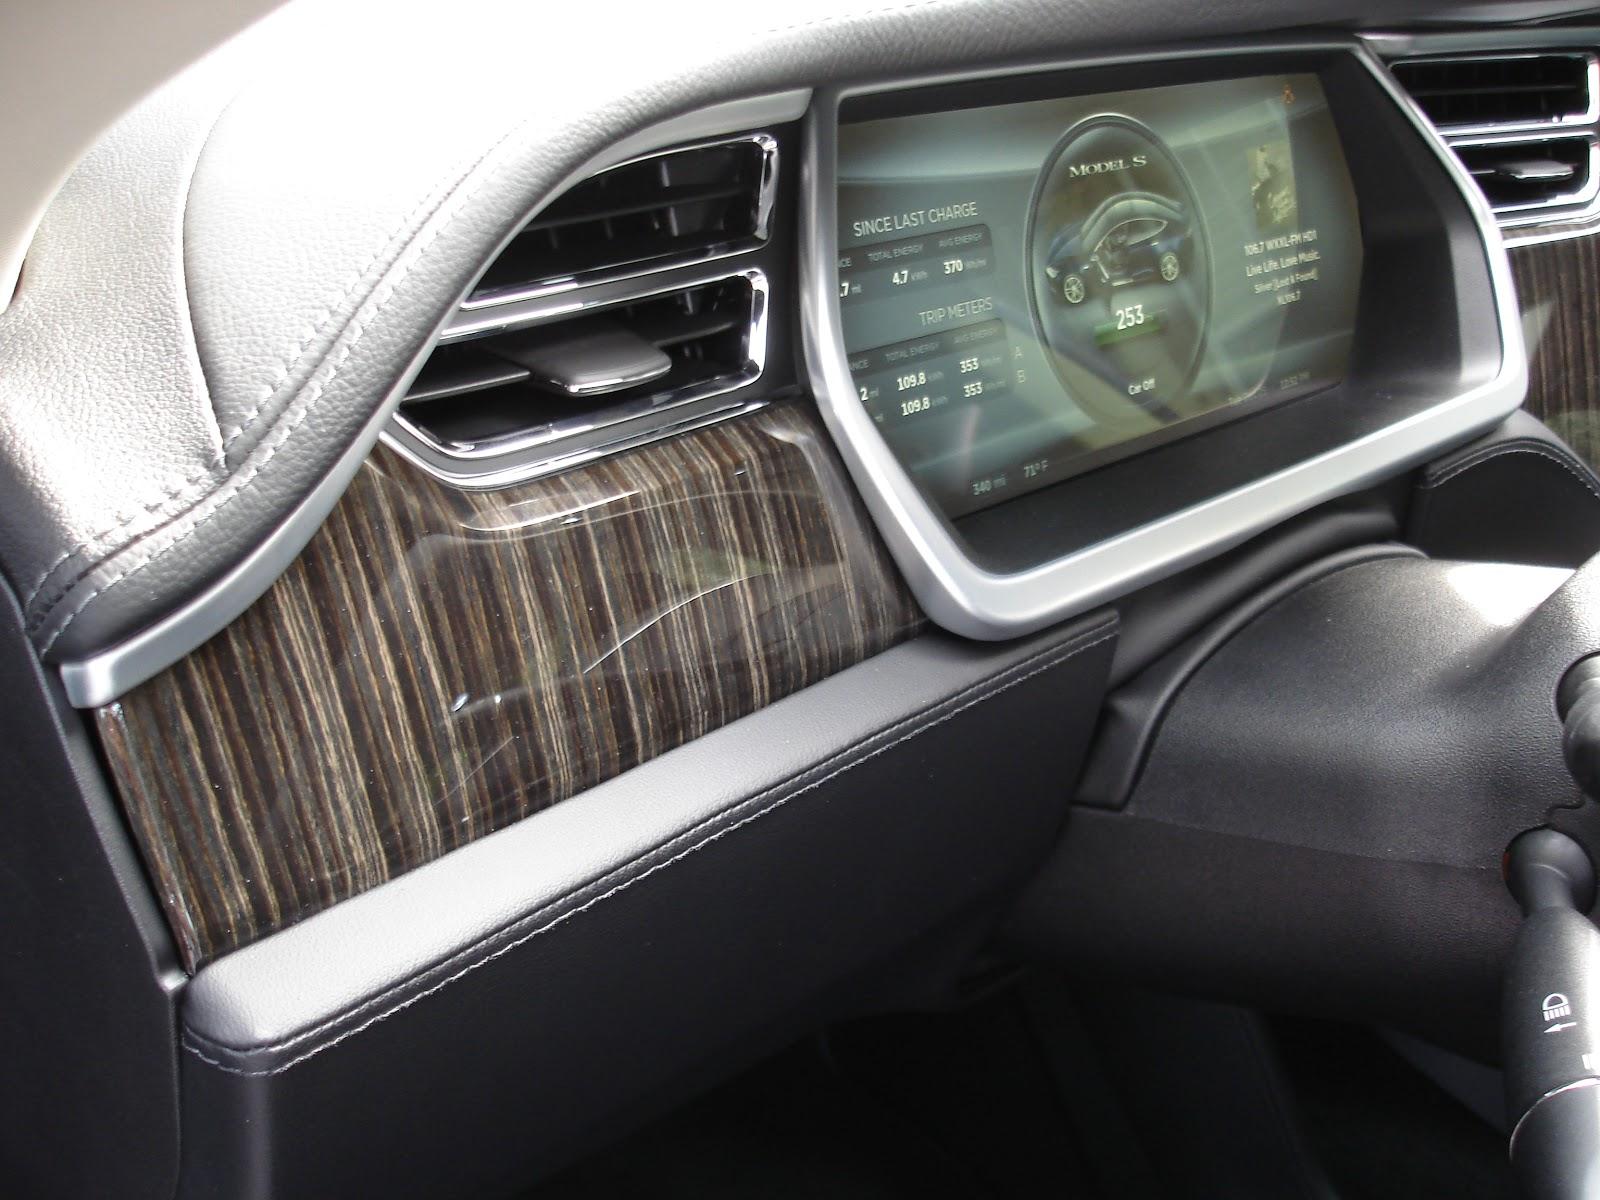 Тест-драйв Tesla Model S - приладова панель